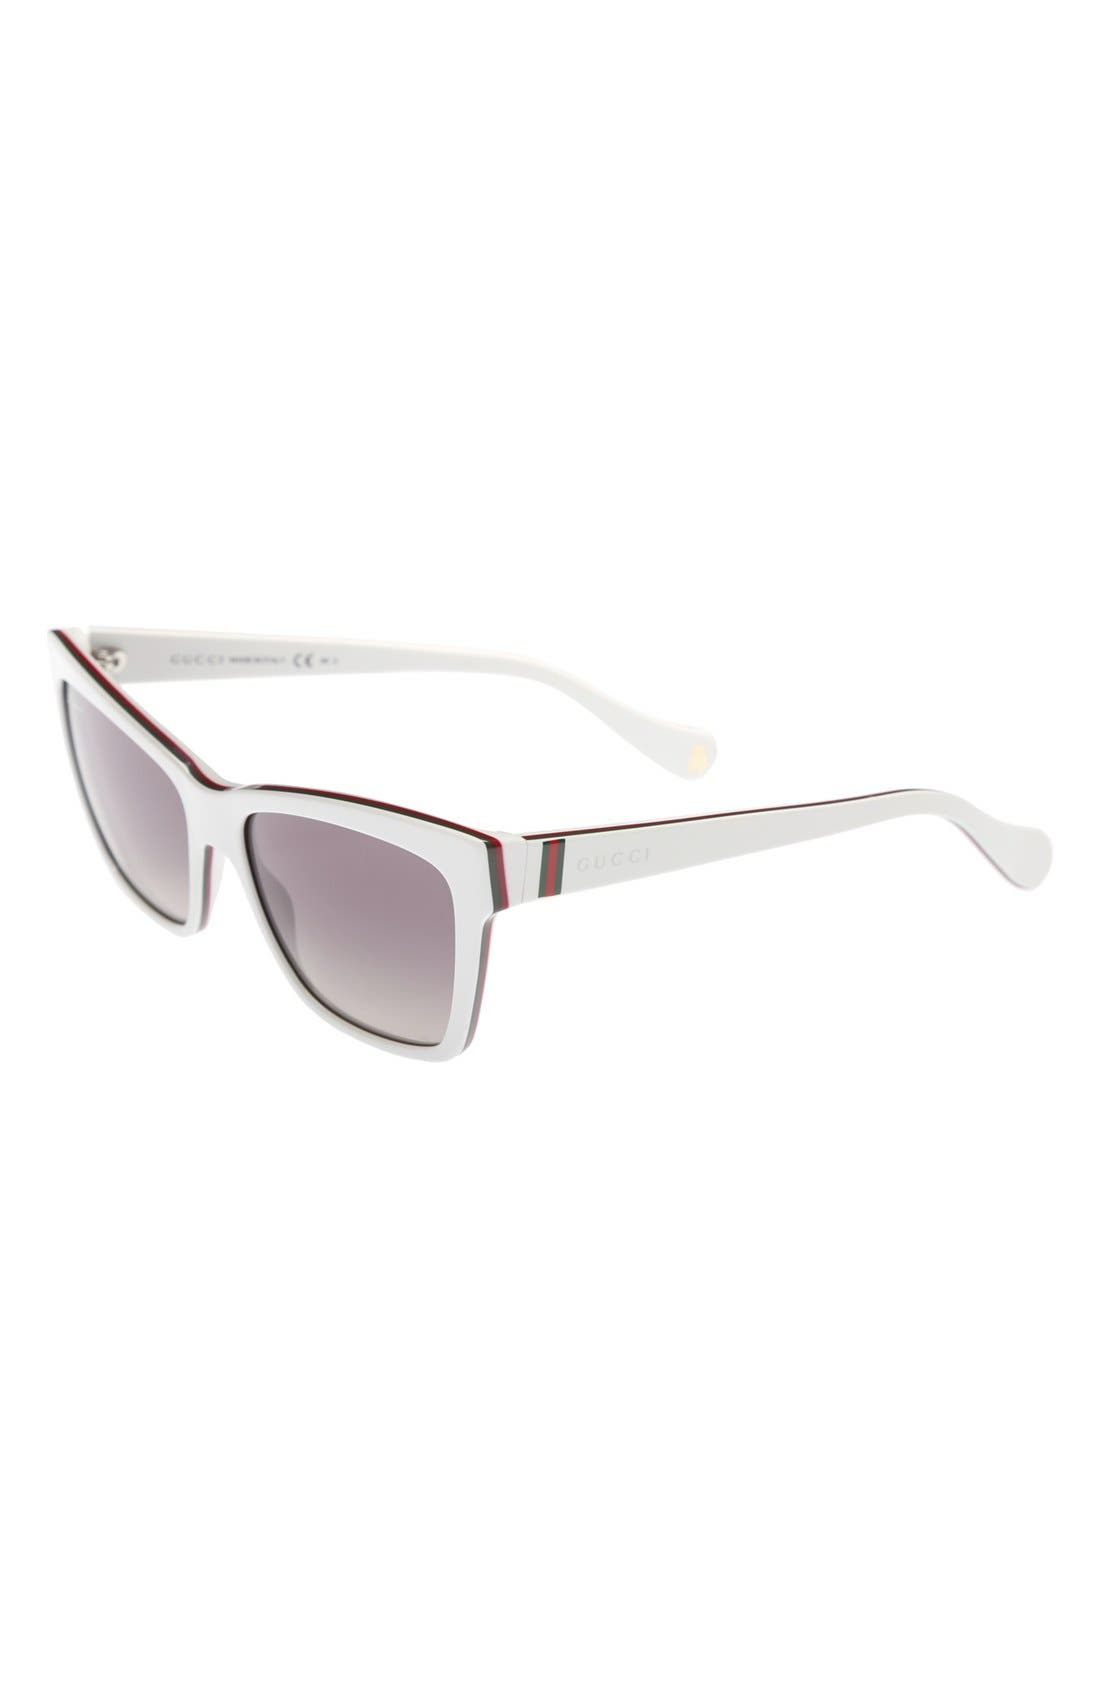 Main Image - Gucci 50mm Retro Sunglasses (Girls)